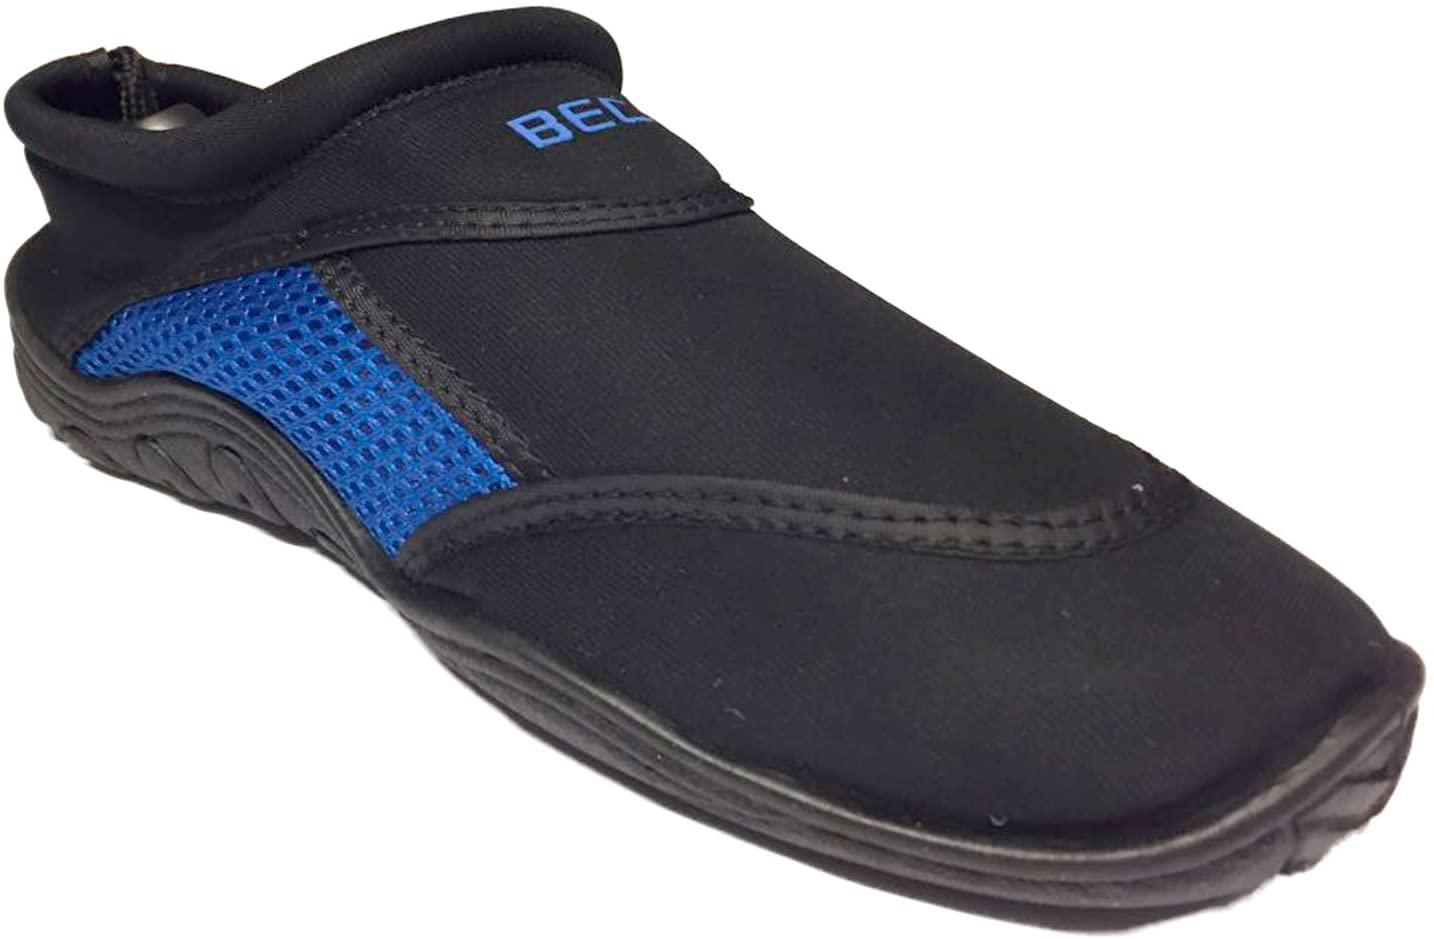 Beco Surf und Badeschuhe Shoes, Blue/Black, 6.5 UK